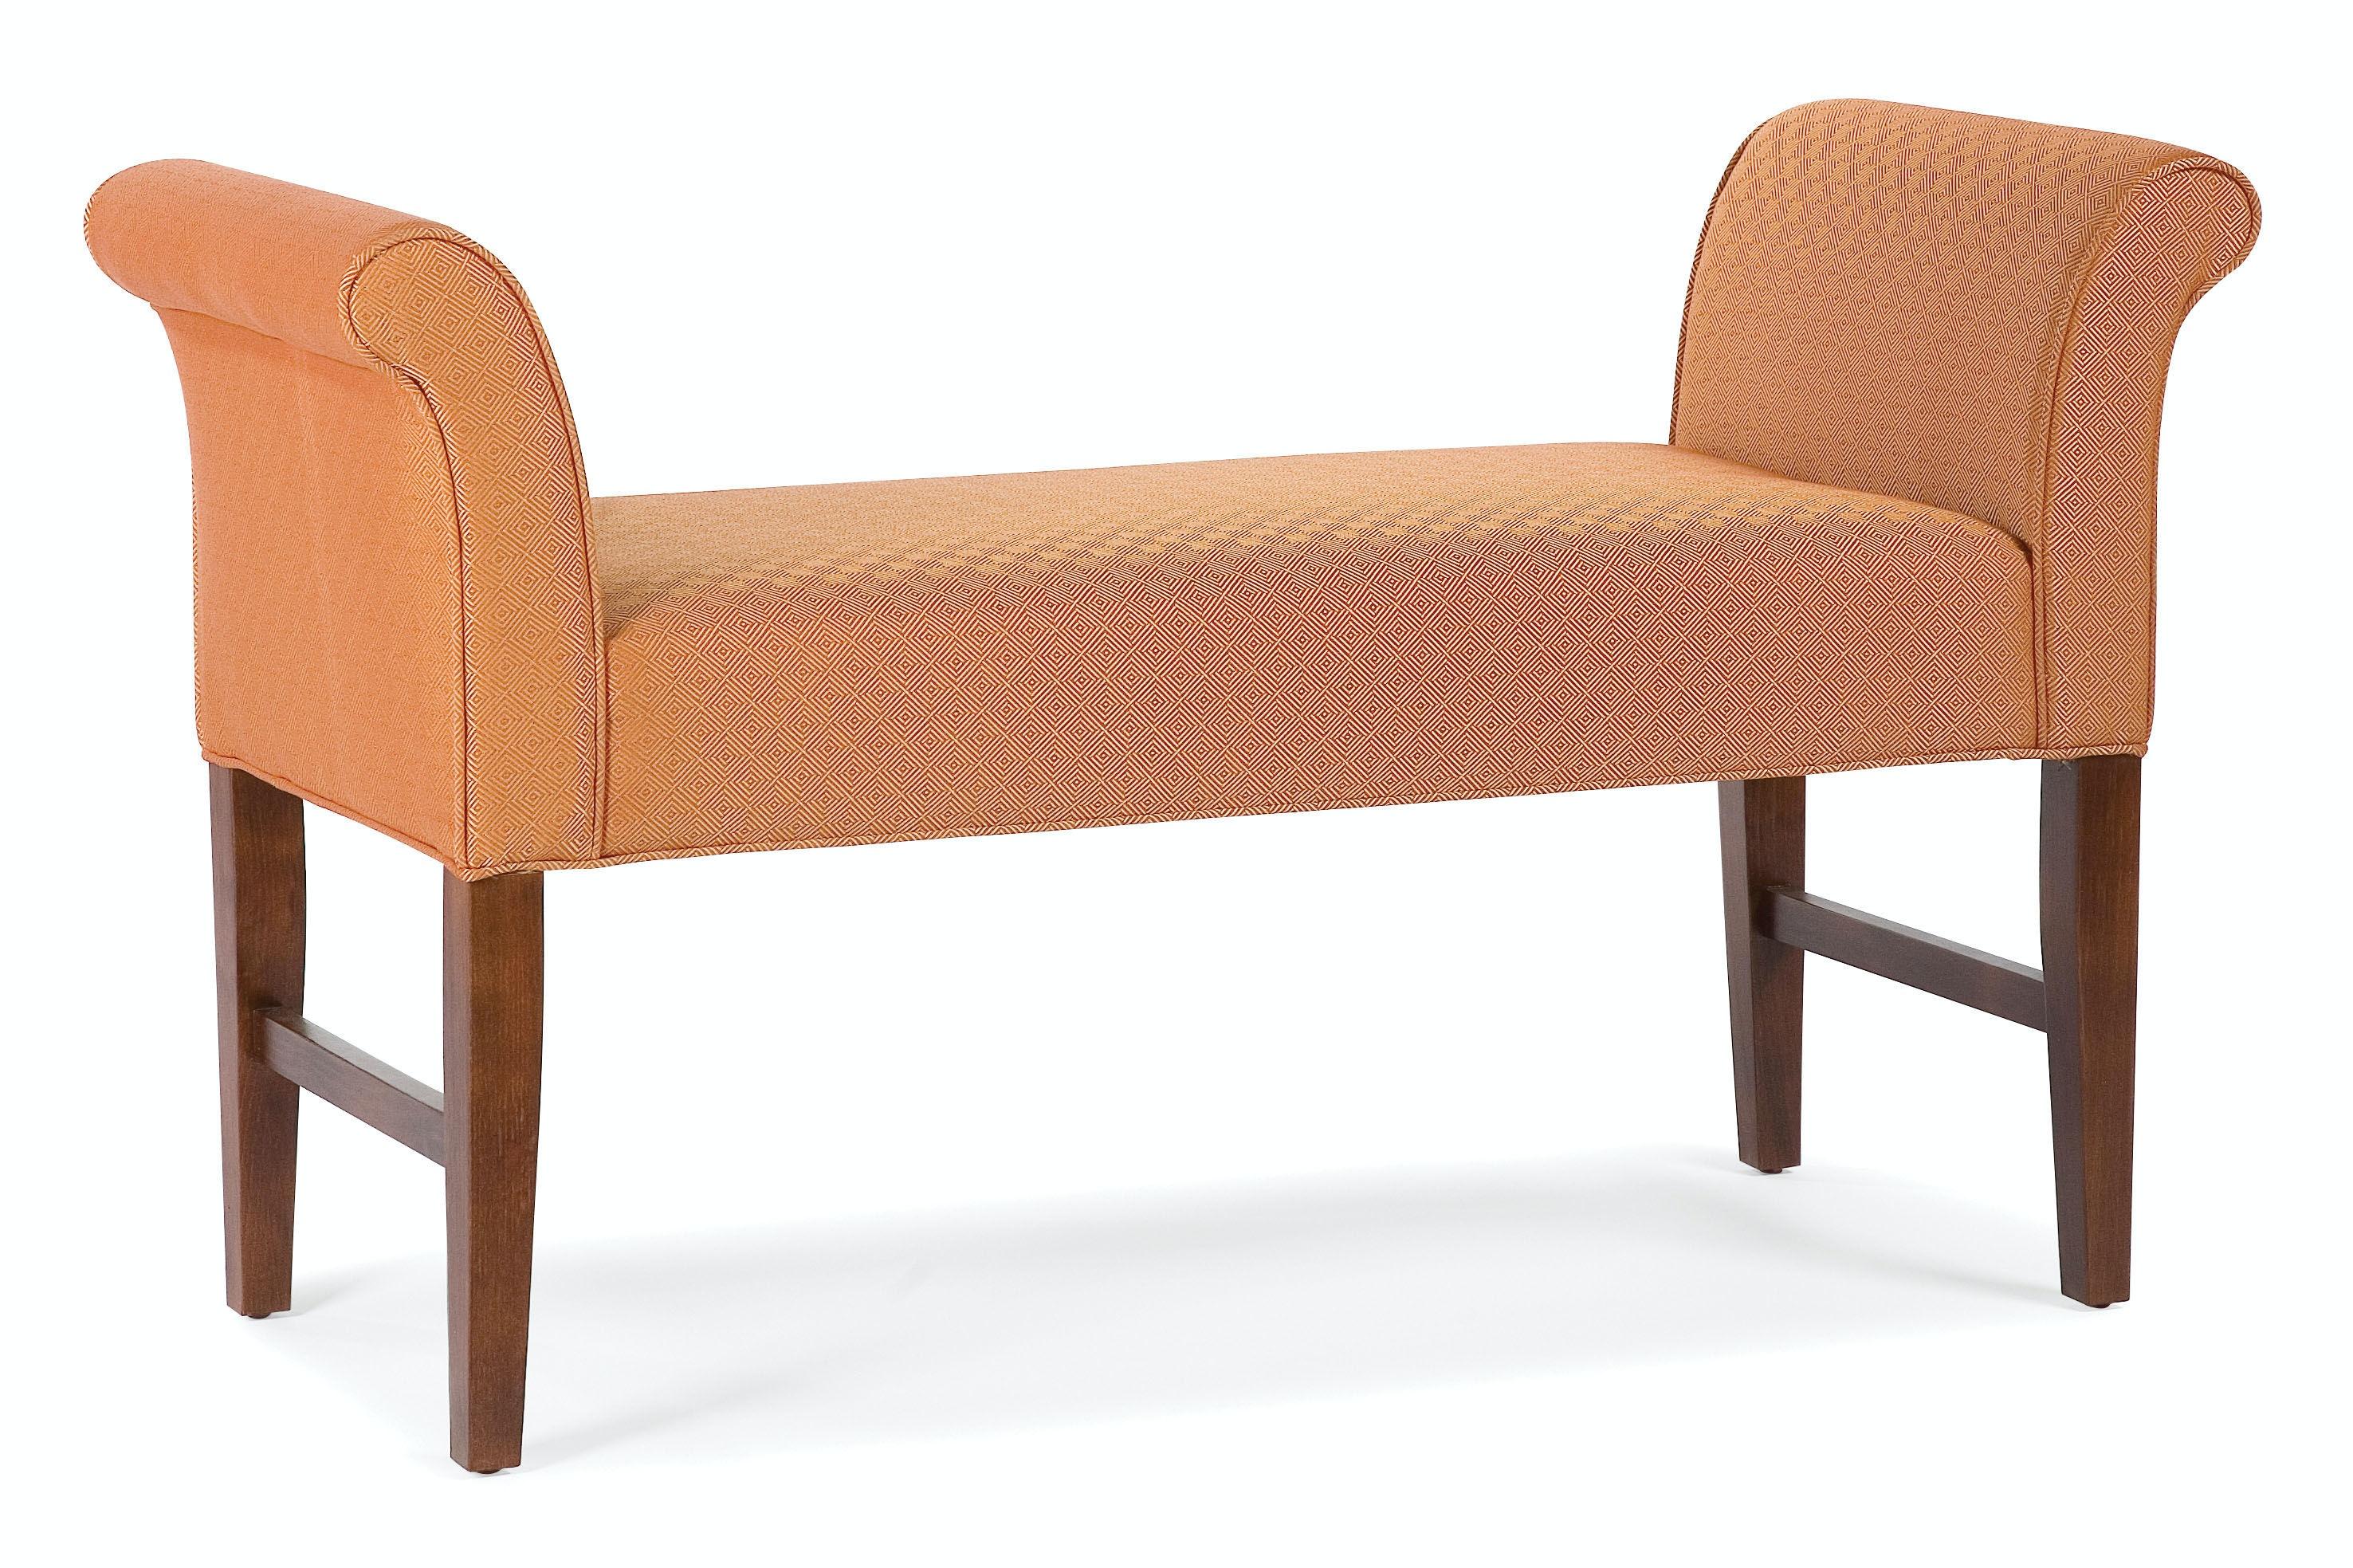 georgia chair company ebay eames fairfield living room garfield bench 1704 10